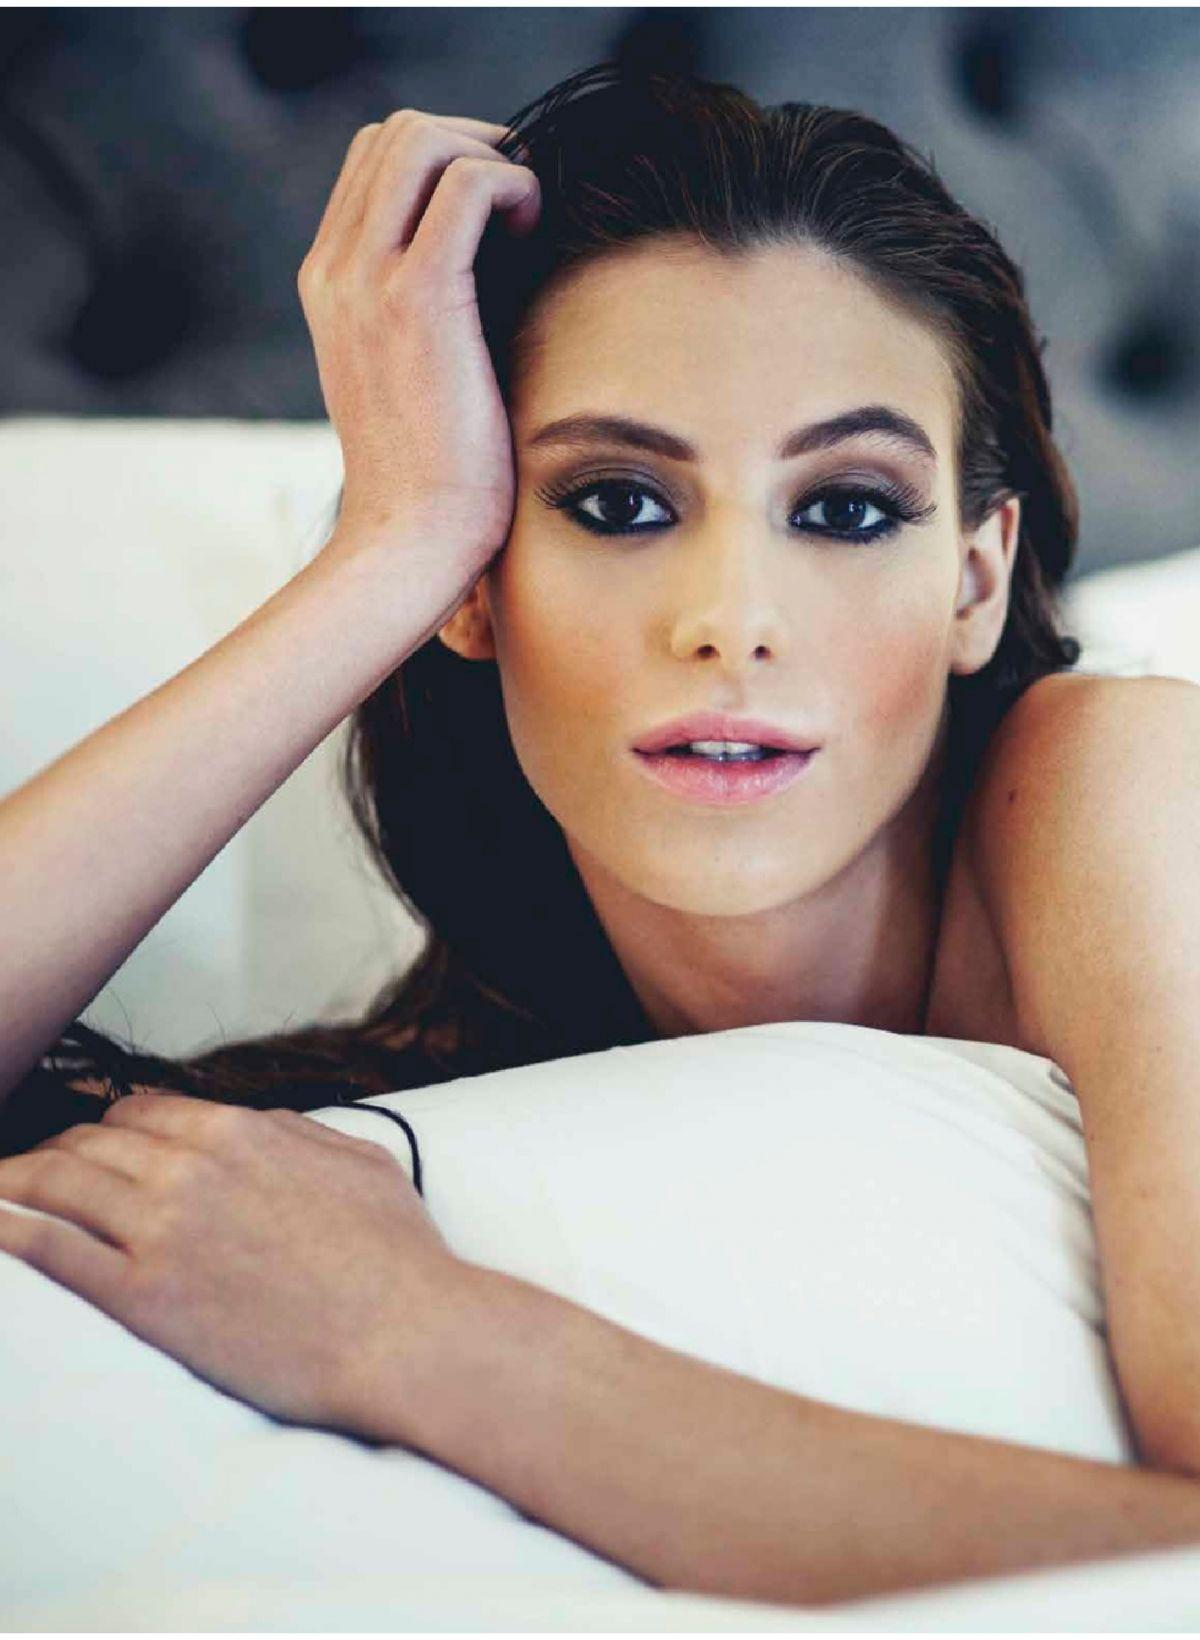 Alejandra guilmant paparazzi nudes (53 photos)